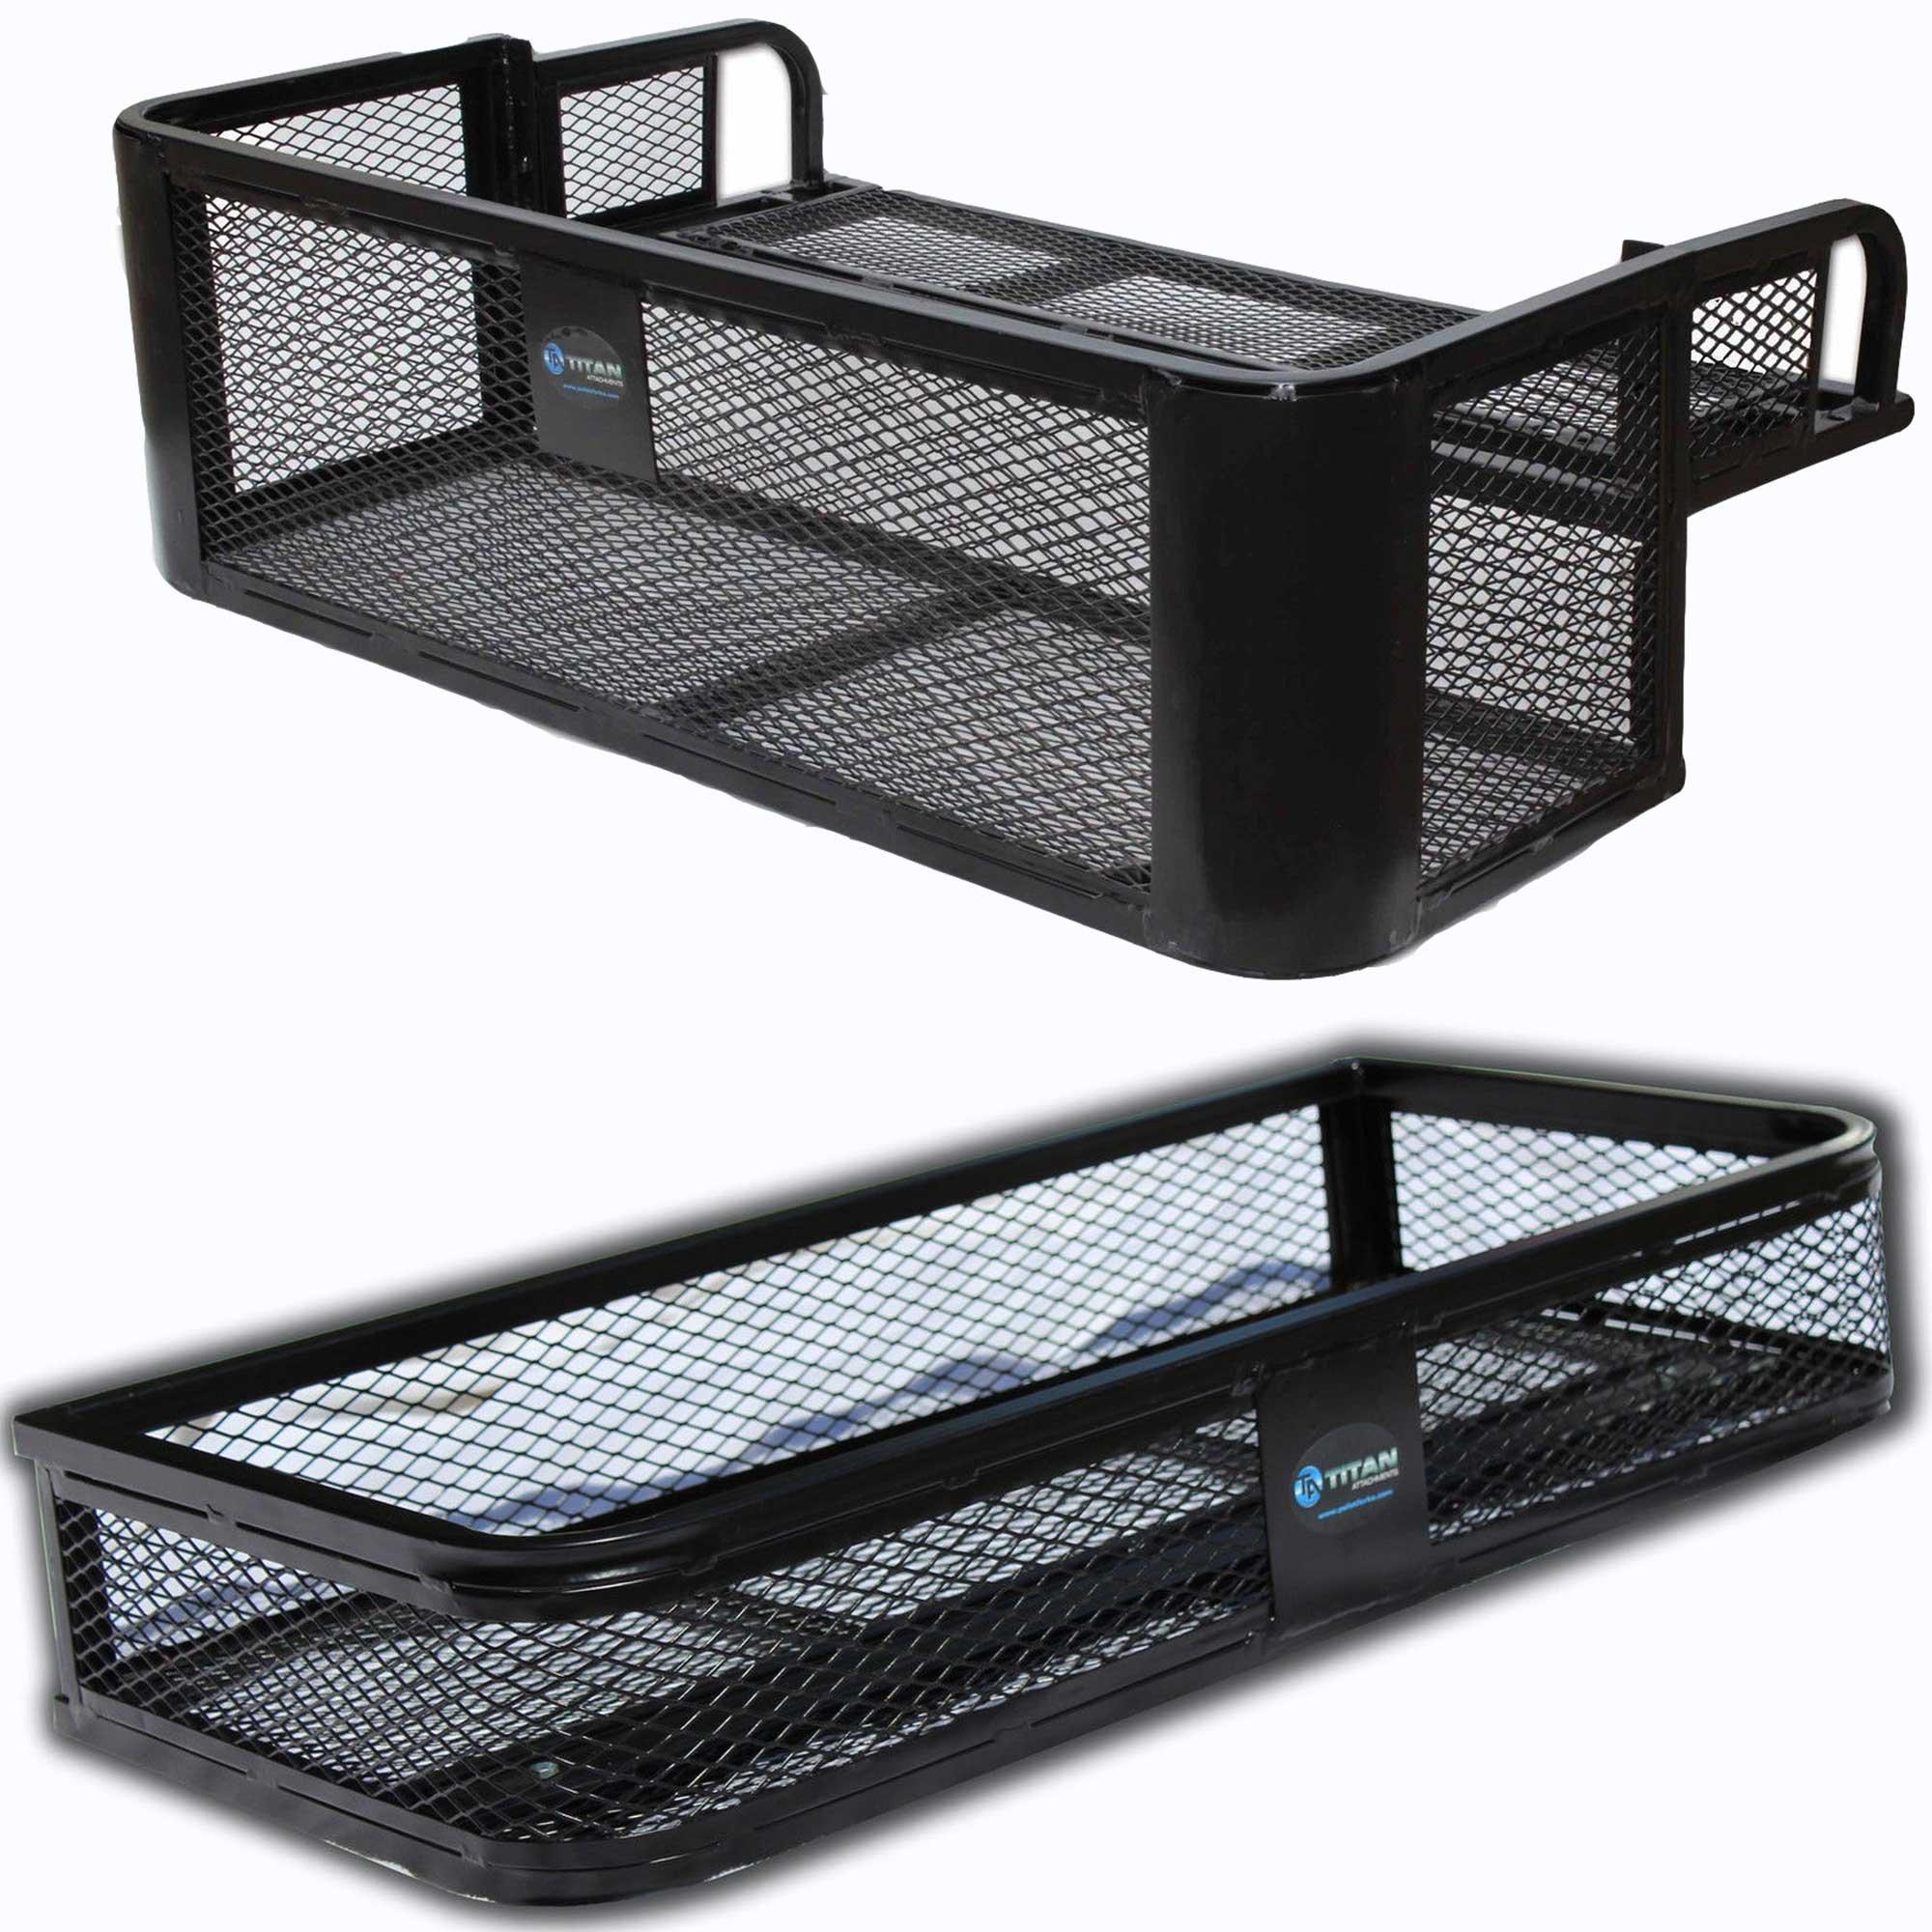 Titan Ramps Universal Front ATV HD Steel Cargo Basket w/Rear Drop Basket Set by Titan Ramps